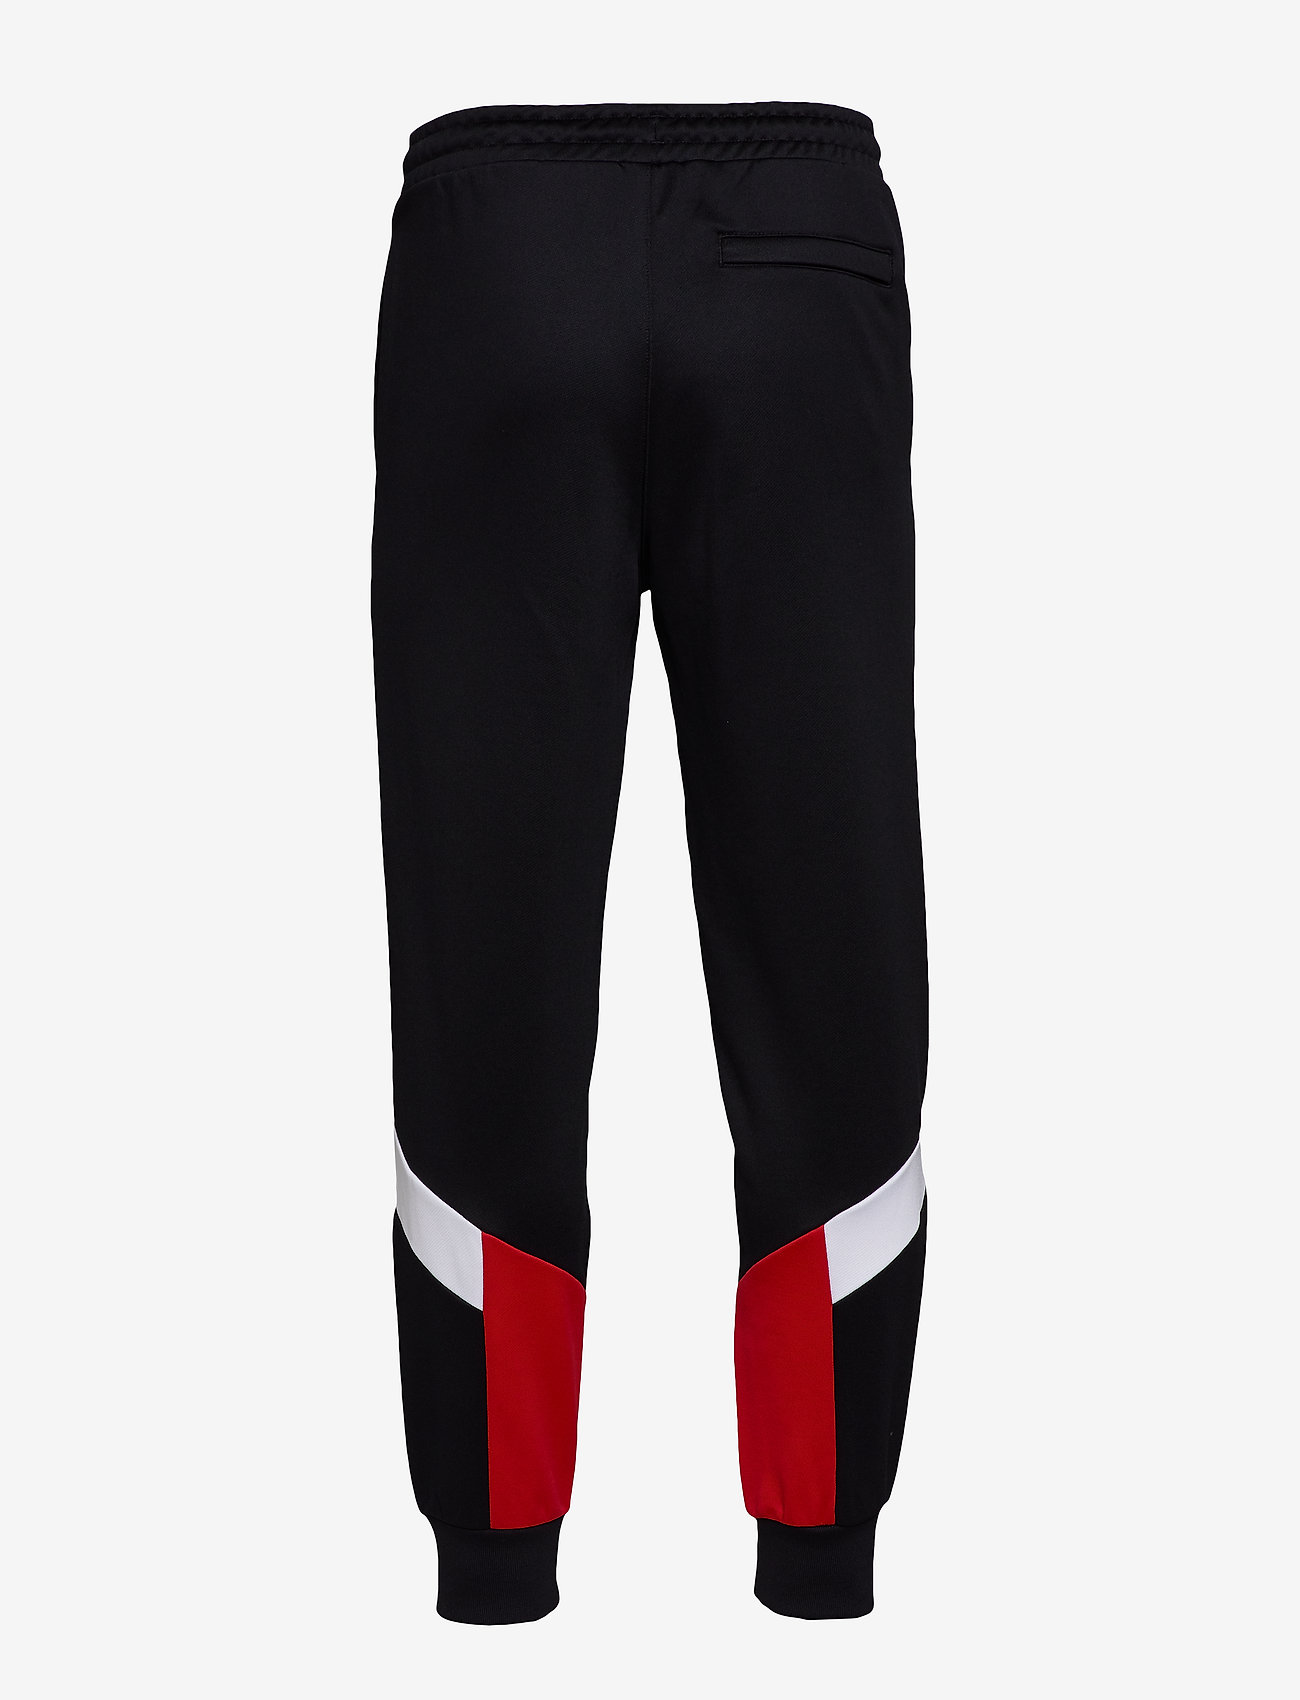 Puma Iconic Mcs Track Pant Cuff - Byxor Black-red Combo